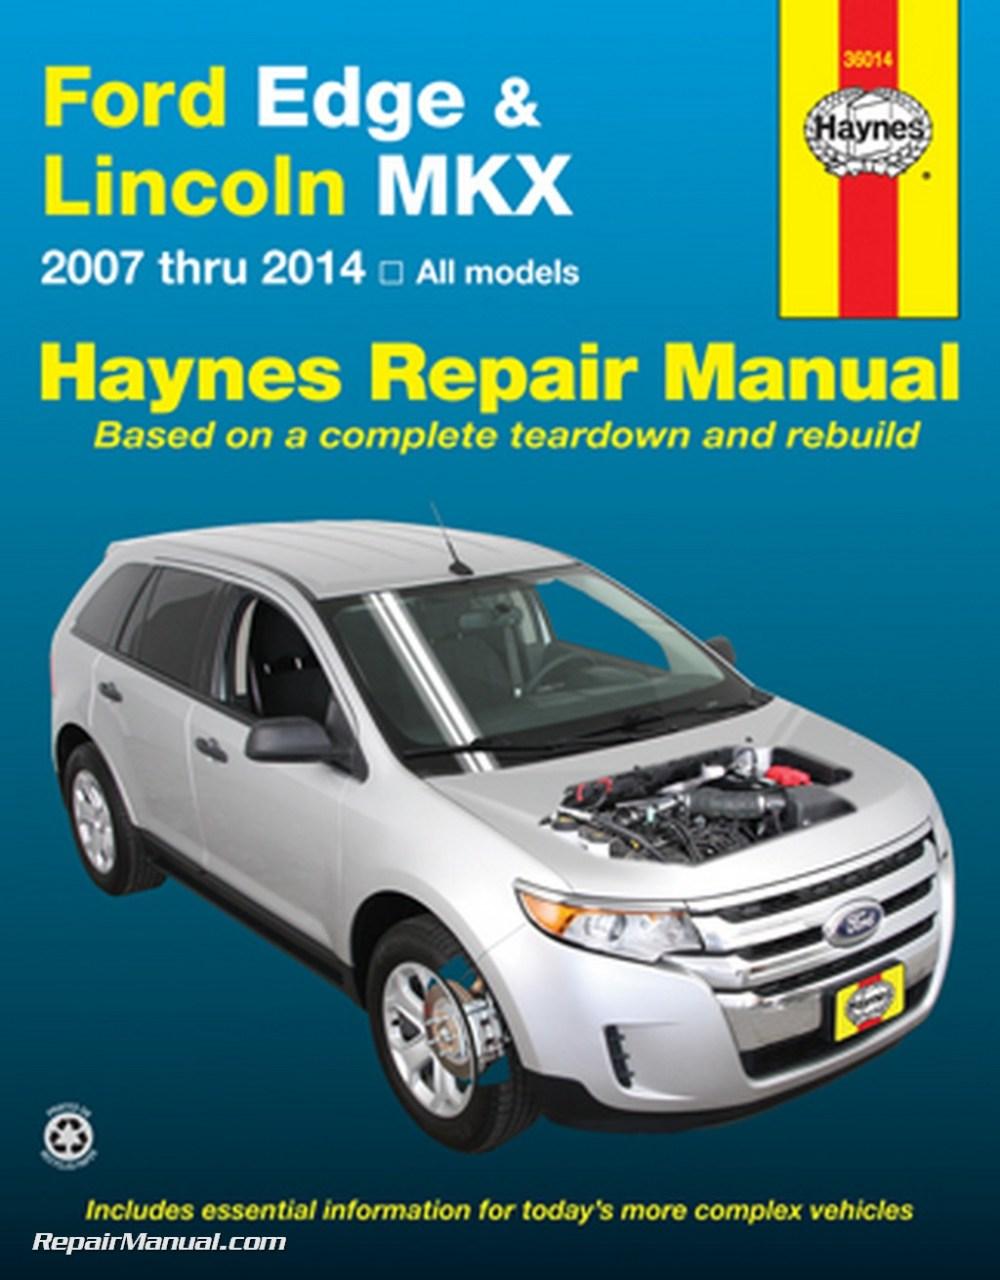 medium resolution of ford edge lincoln mkx haynes repair manual 2007 2014 hayne manual 2007 ford edge engine diagram